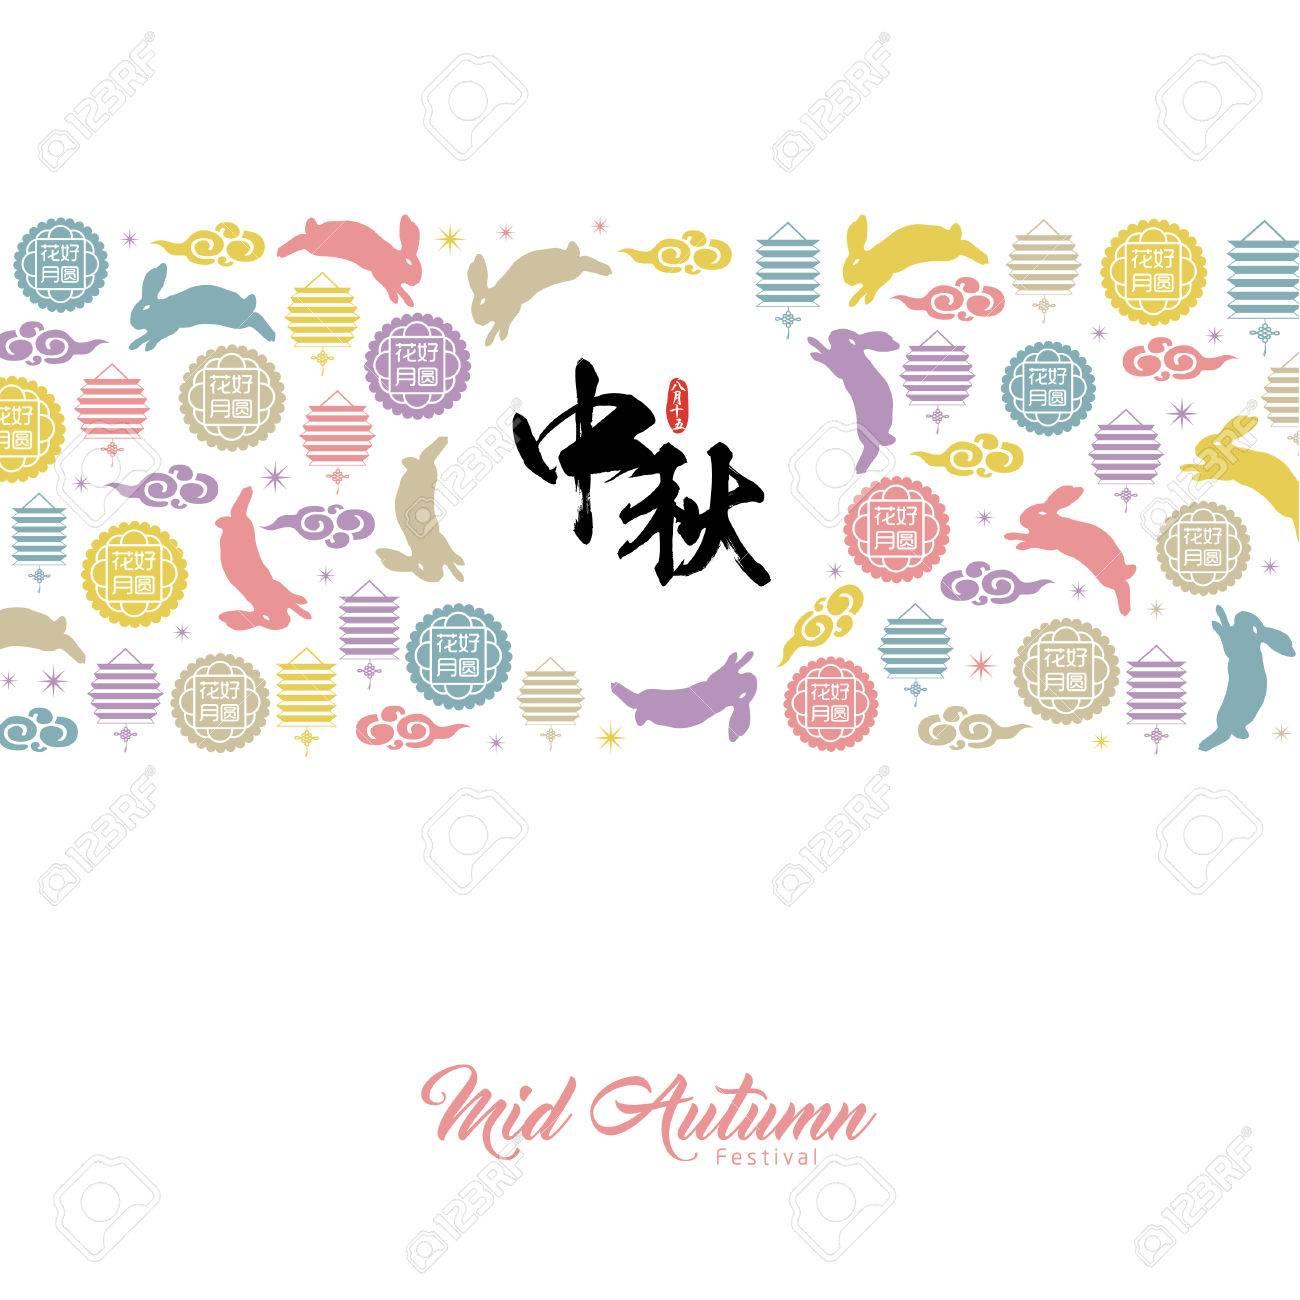 Mid-autumn festival illustration with bunny, moon cakes, lantern and cloud element. Caption: Mid-autumn festival, 15th august - 85034081